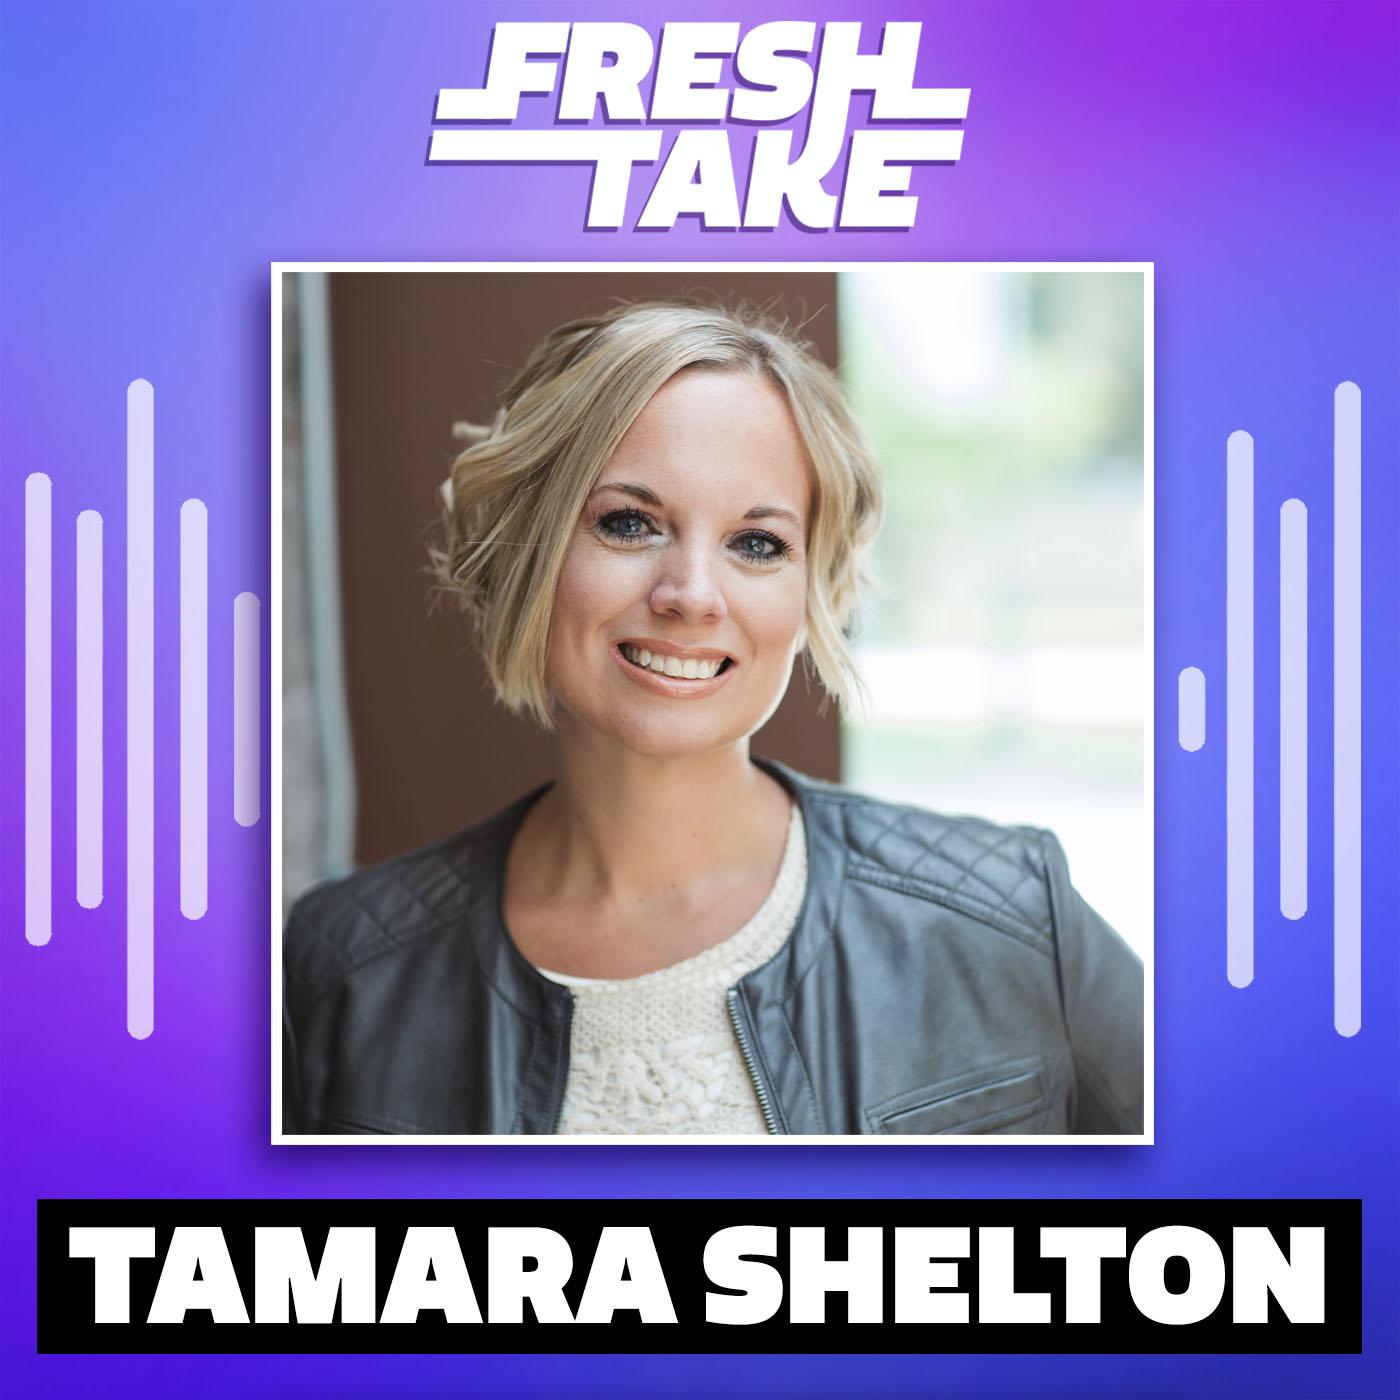 S01E02 - Tamara Shelton.jpg